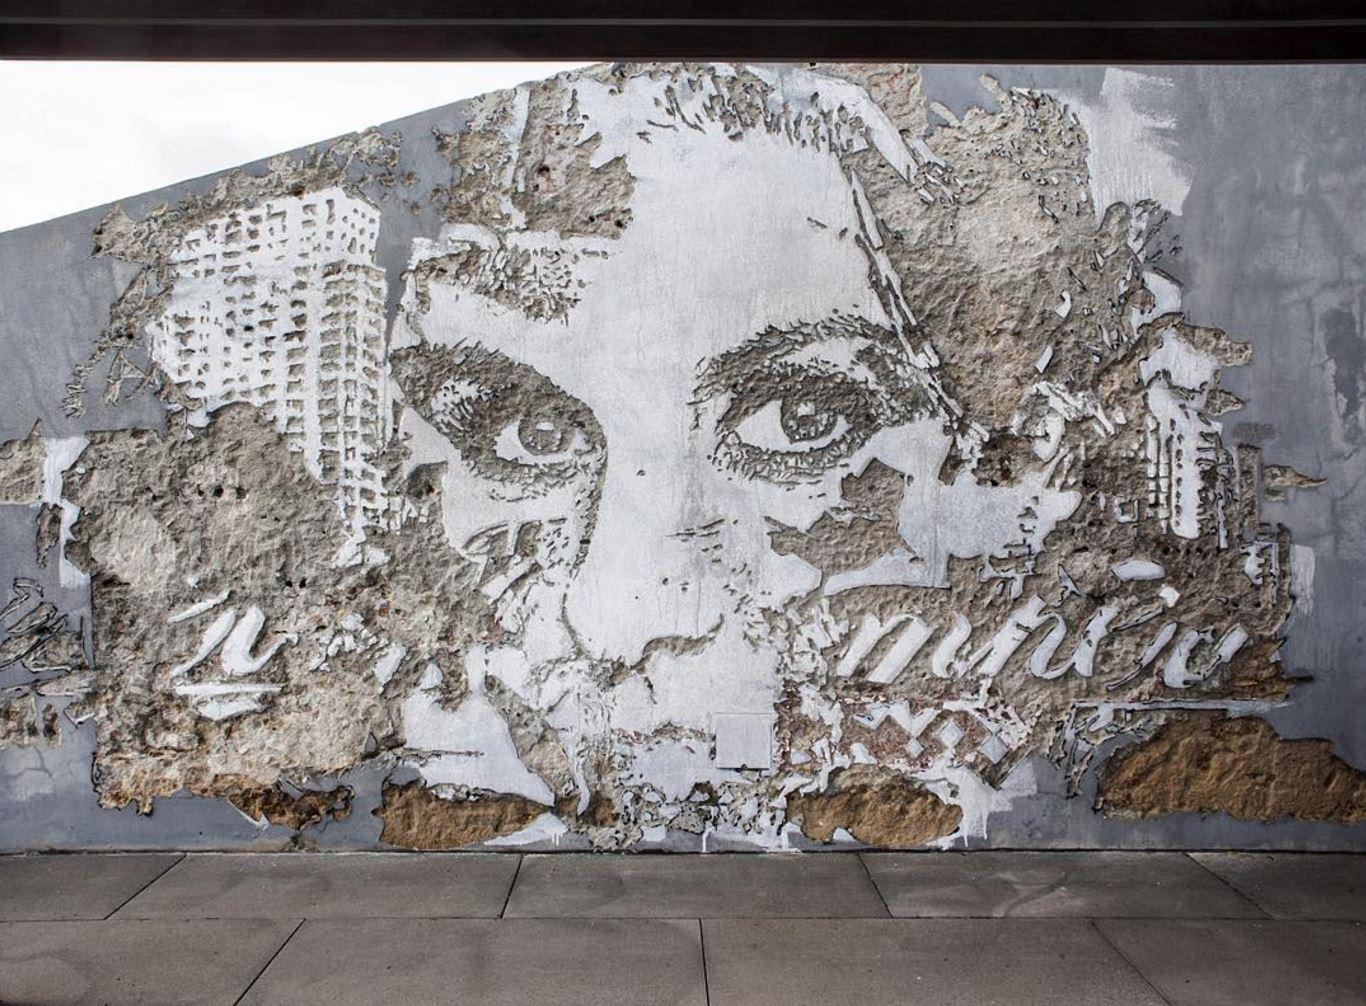 vhils graffiti escutura vandalismo dionisio arte (13)